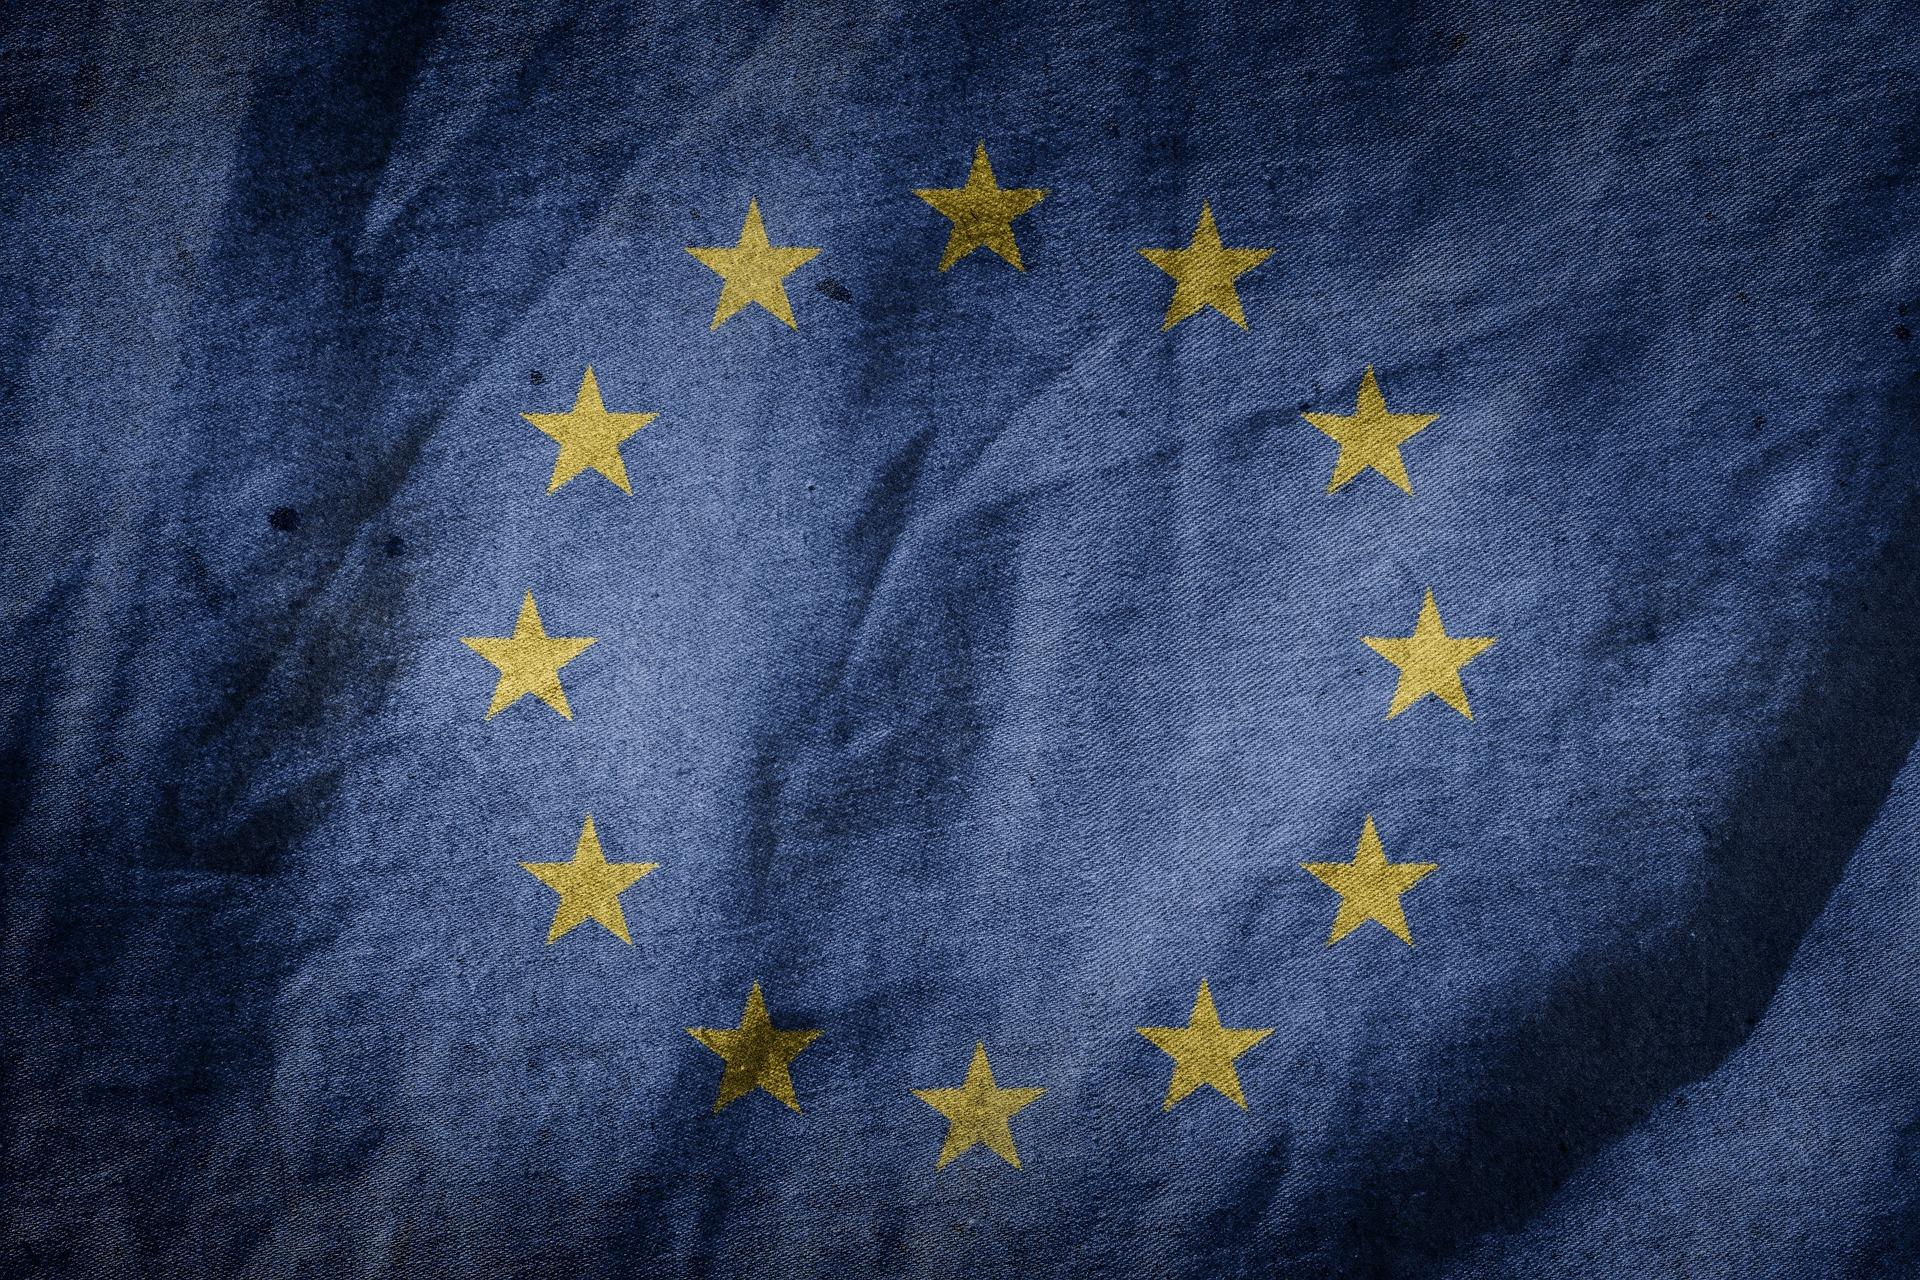 A close up of the European Union Flag